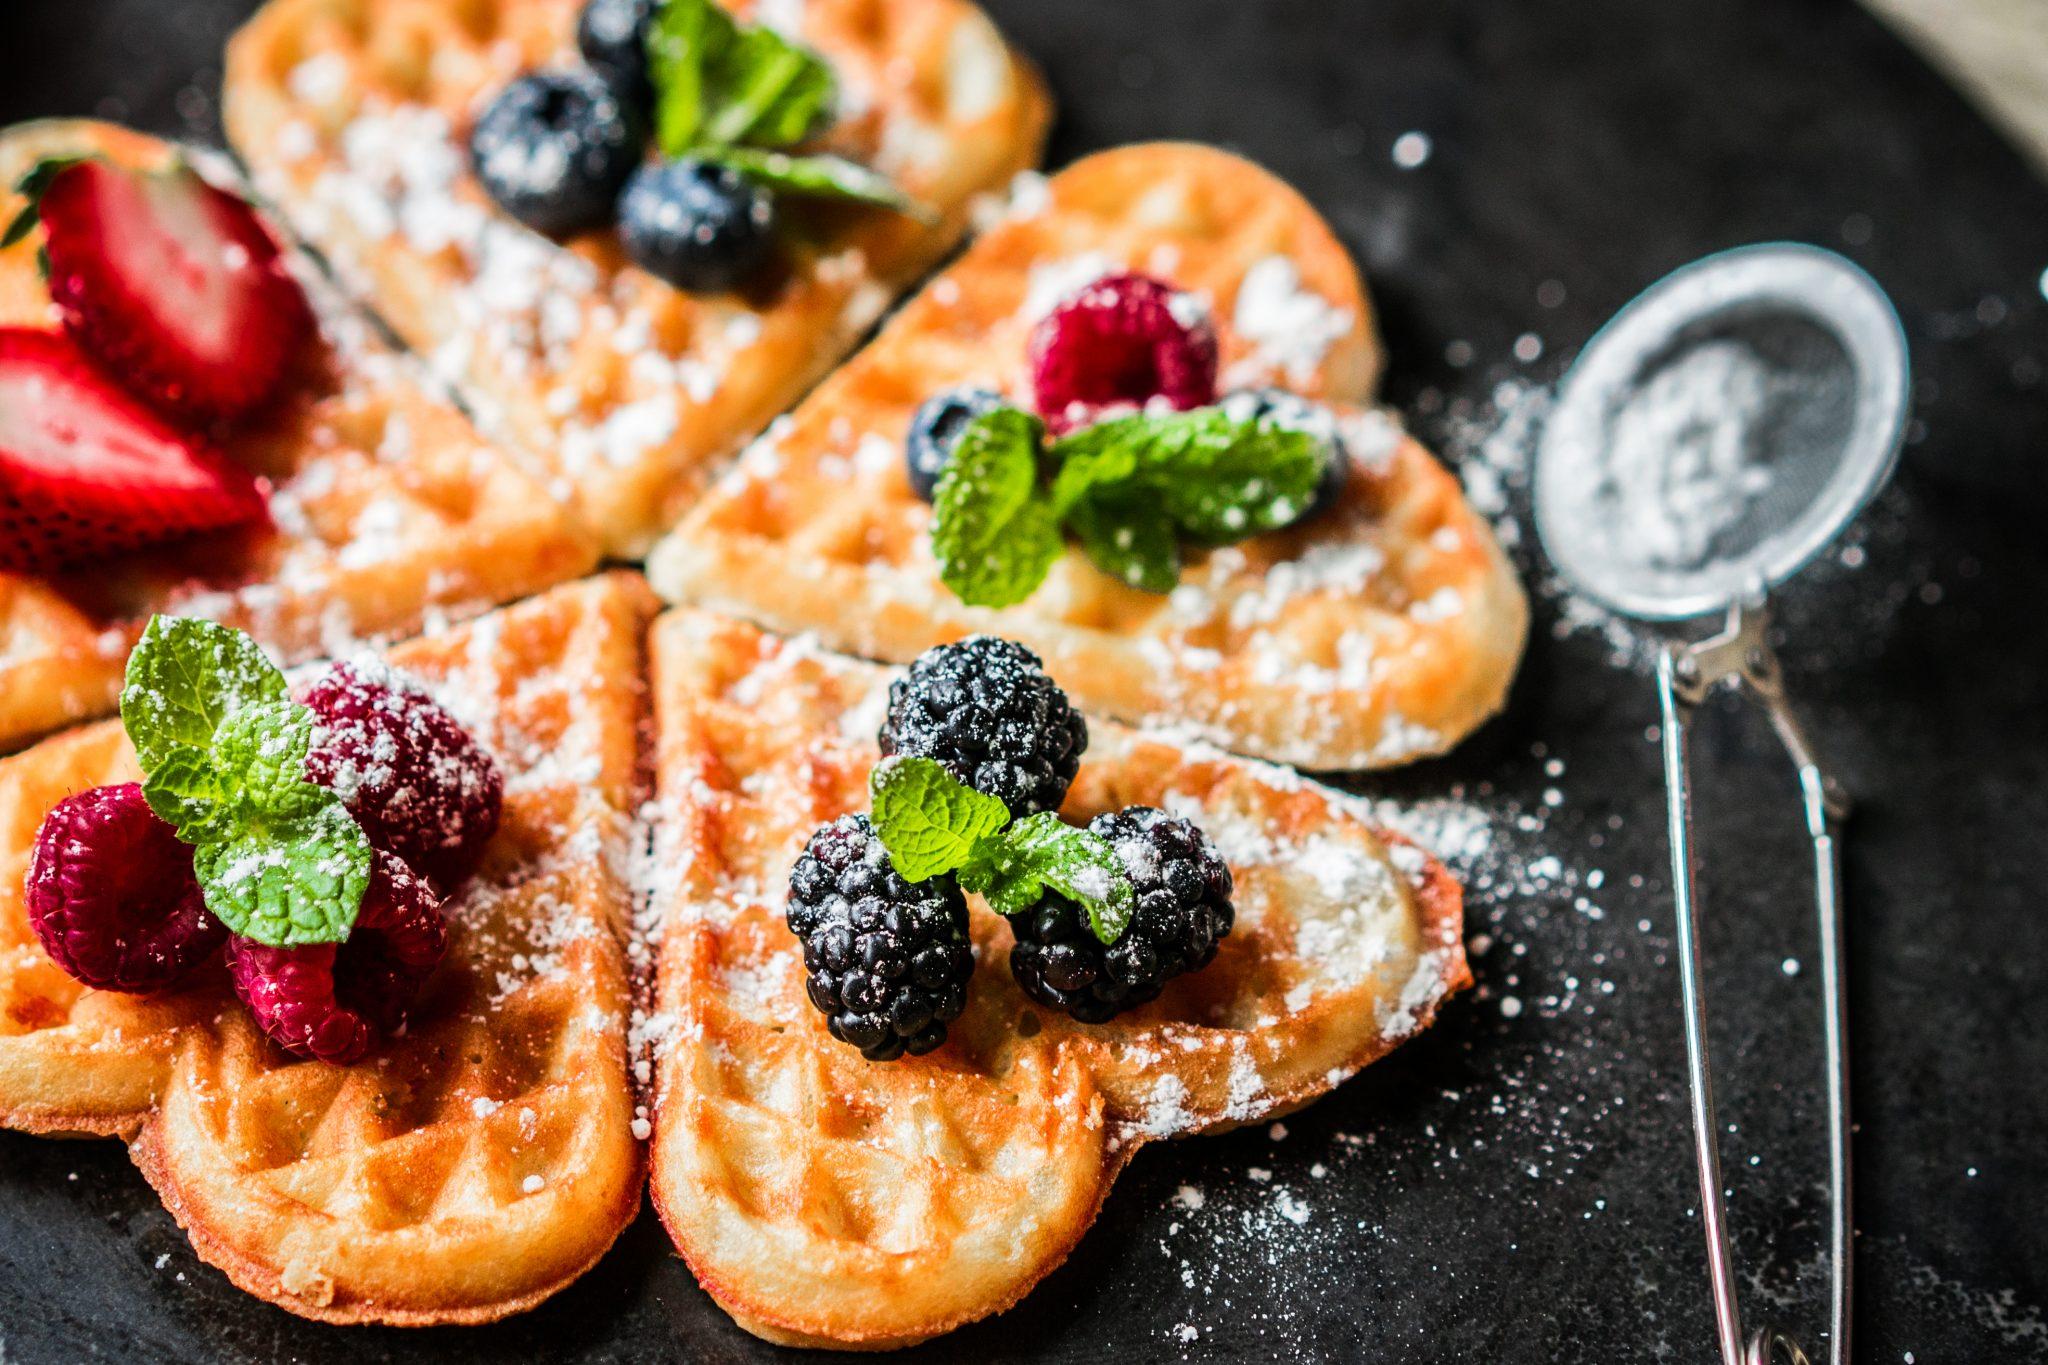 10 easy valentines day breakfast ideas - Valentines Day Breakfast Ideas